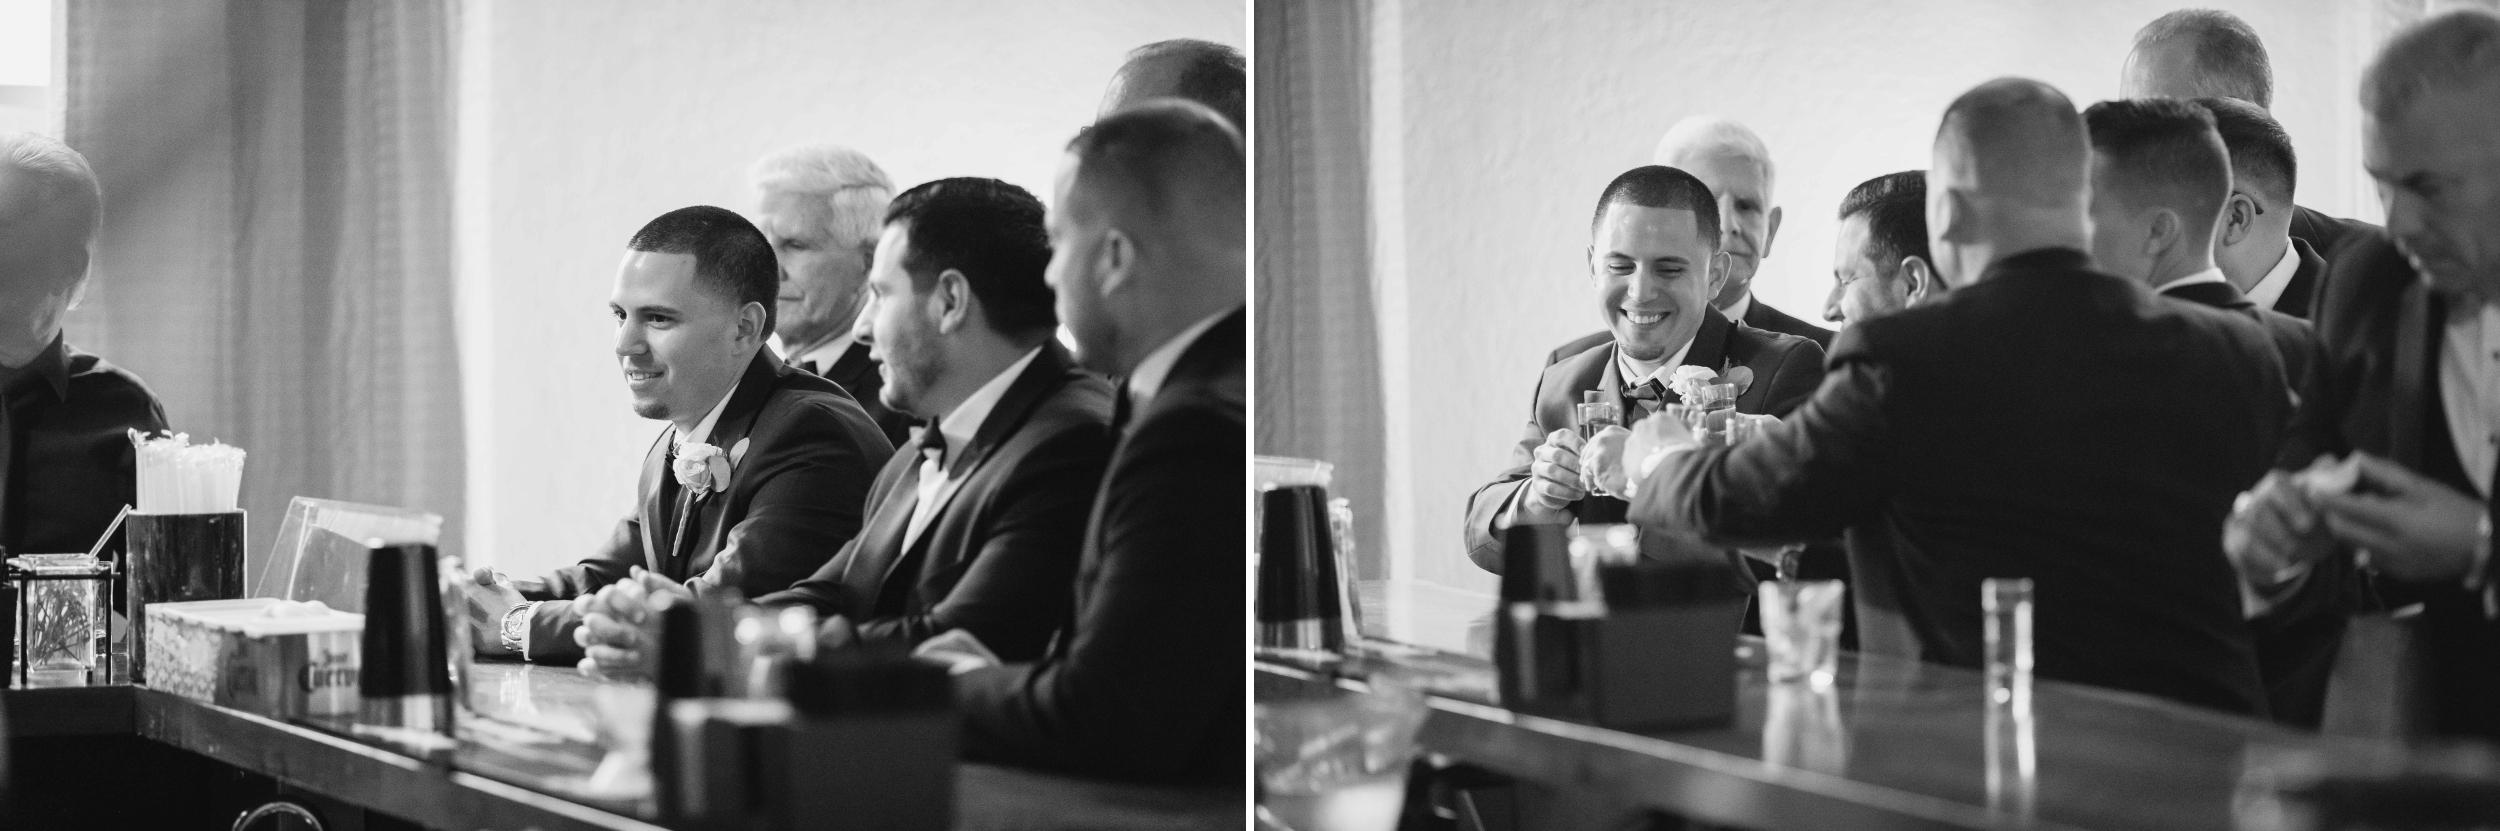 Wedding - Coco Plum - Coral Gables Congregational - Santy Martinez Photography 5.jpg